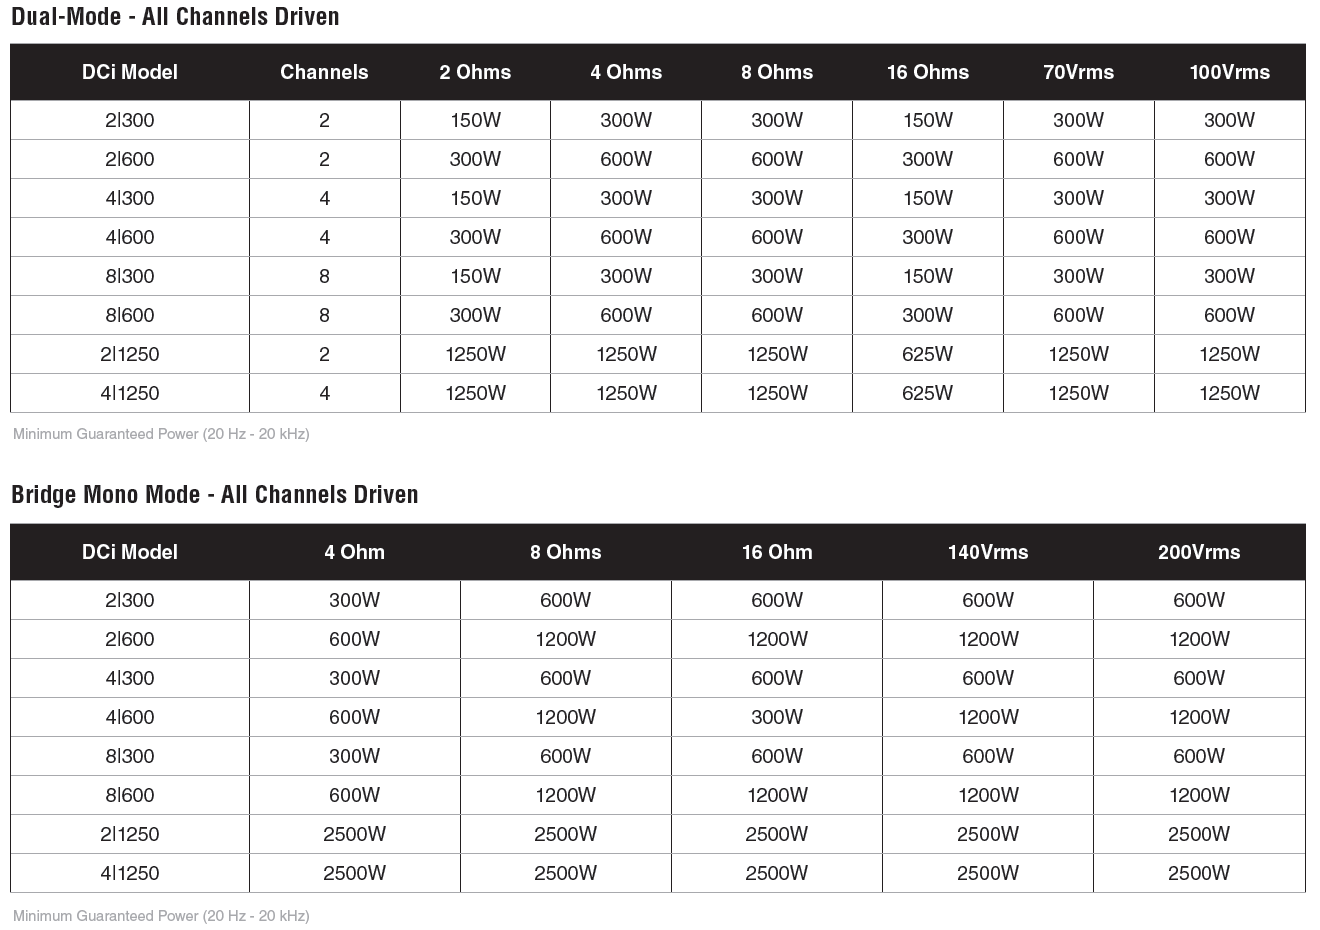 Crown DCi 4|600 Analog Power Amplifier - Screen Shot 2015 08 27 at 3.29.38 PM original